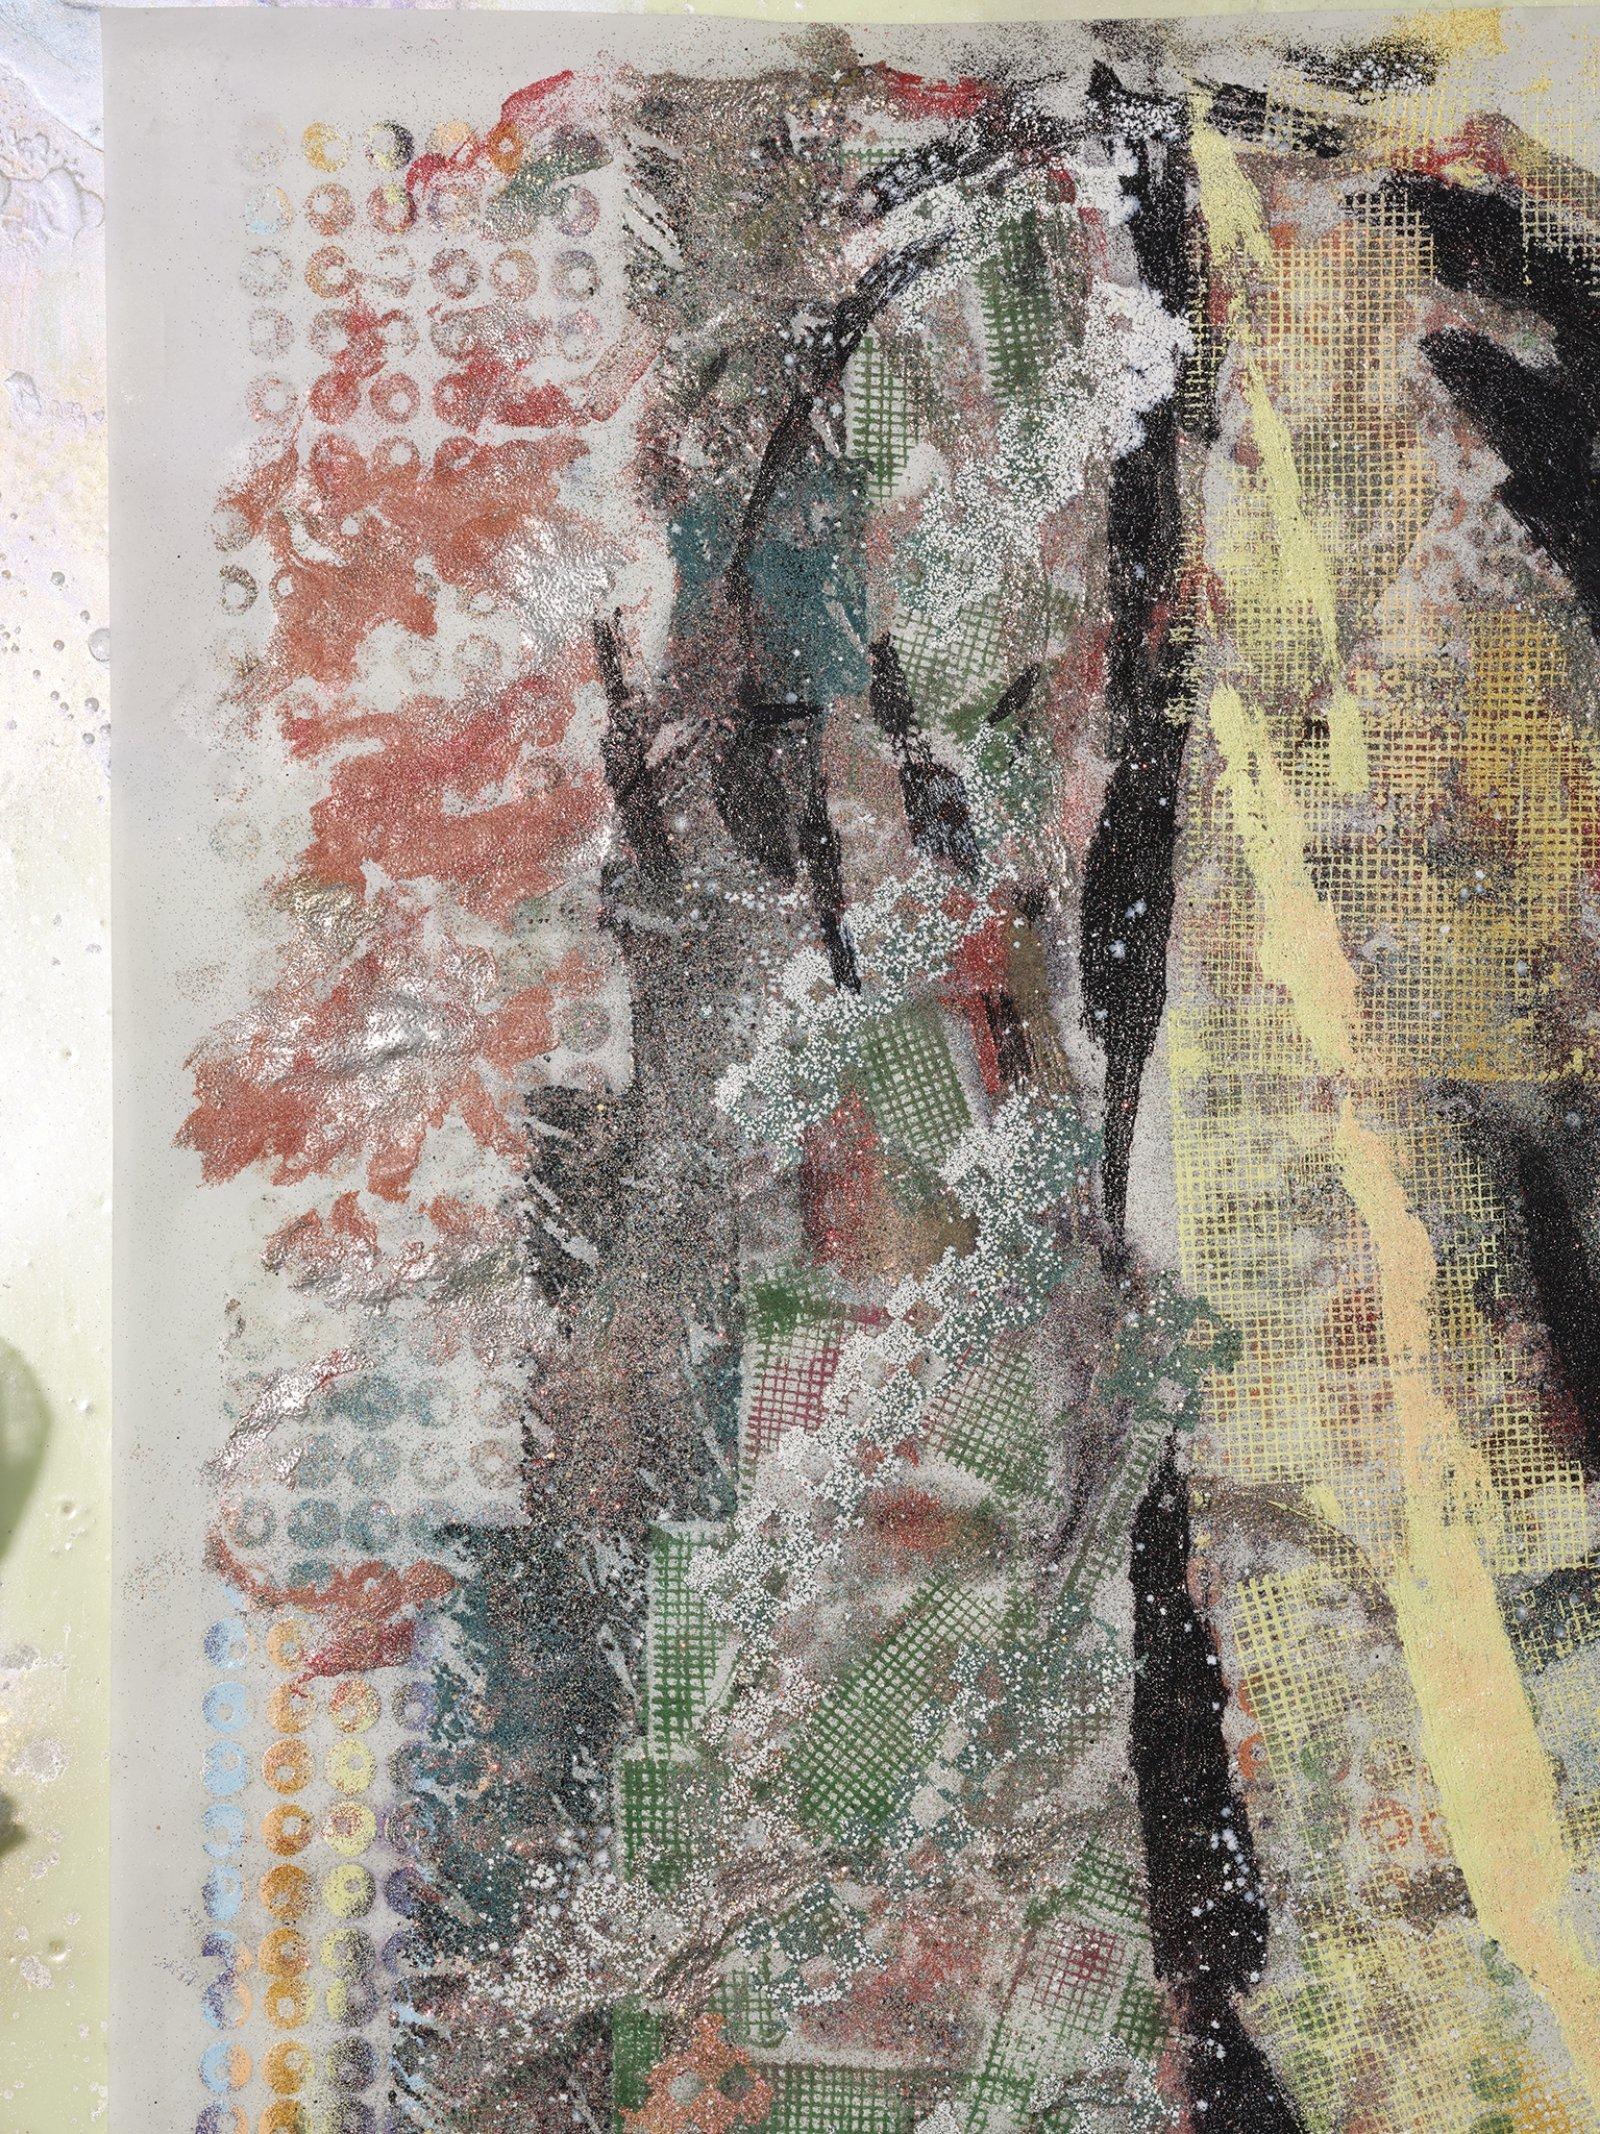 Rebecca Brewer, Live Resin: Garbage Wave (detail), 2019, urethane resin, aluminum mesh, pigment, plexiglas, embossing powder on vellum, 41 x 29 in. (104 x 74 cm)